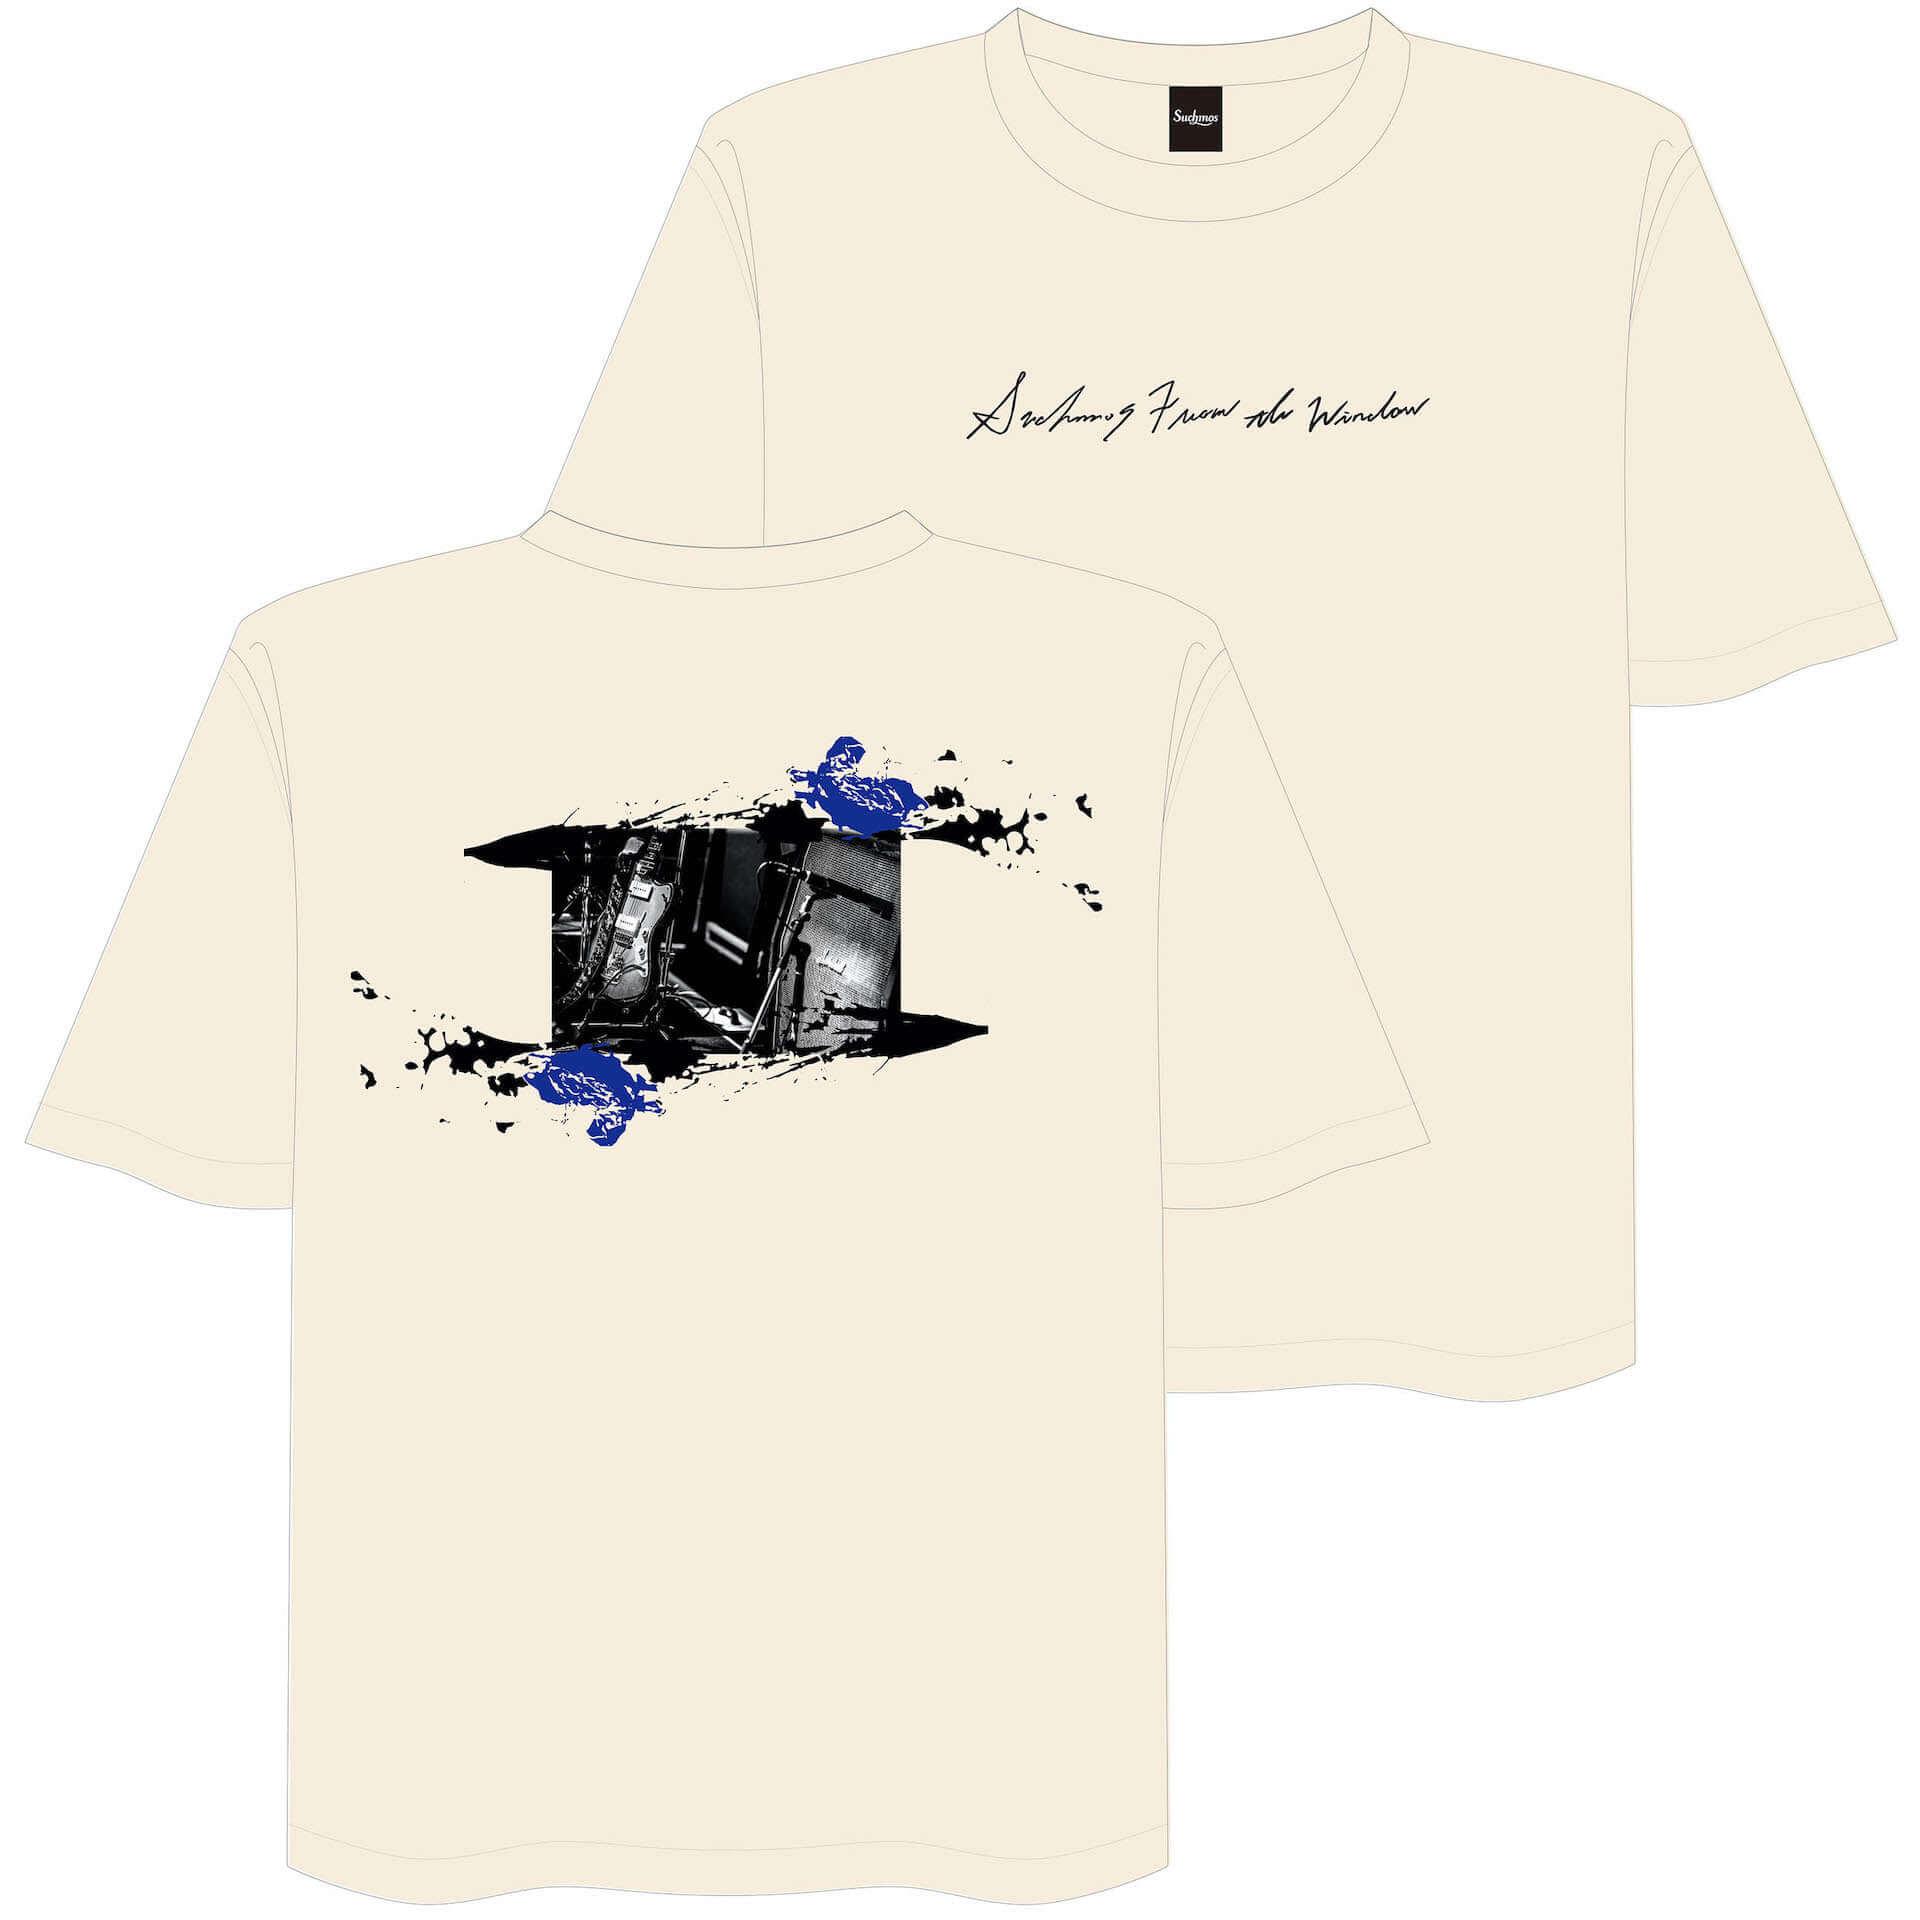 SuchmosのKCEE、TAIHEIがデザインした新作Tシャツが販売決定|LIVEWIRE出演記念&バンド初の受注生産グッズとしてリリース music200715_livewire-suchmos_3-1920x1920